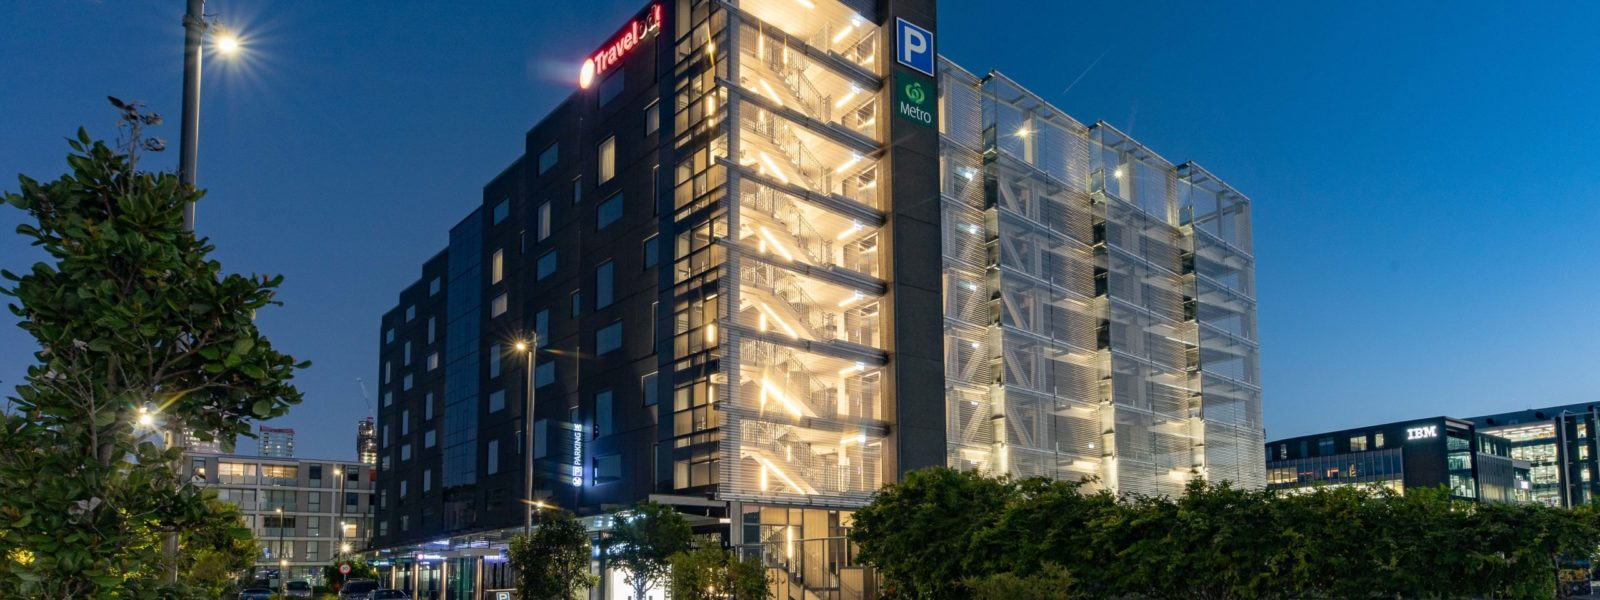 Wynyard 100 Hotel Development